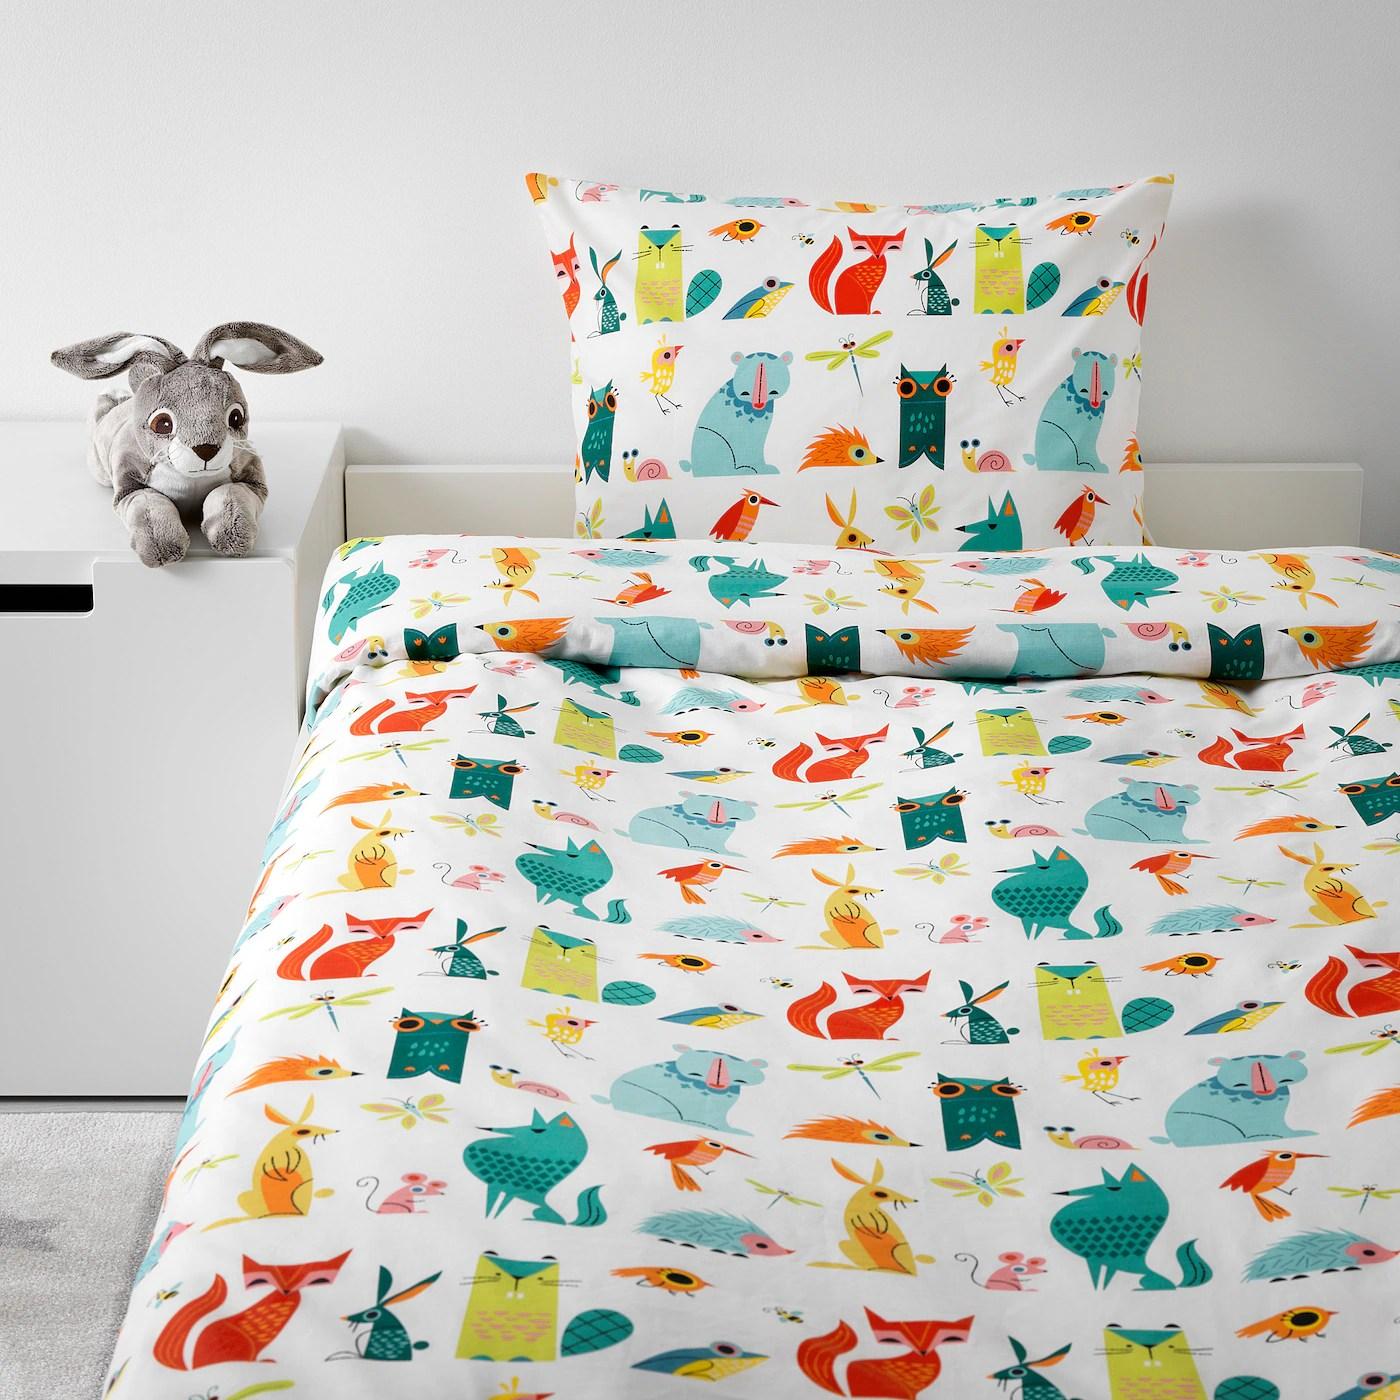 Lattjo Housse De Couette Et Taie Animal Multicolore 150x200 65x65 Cm Ikea